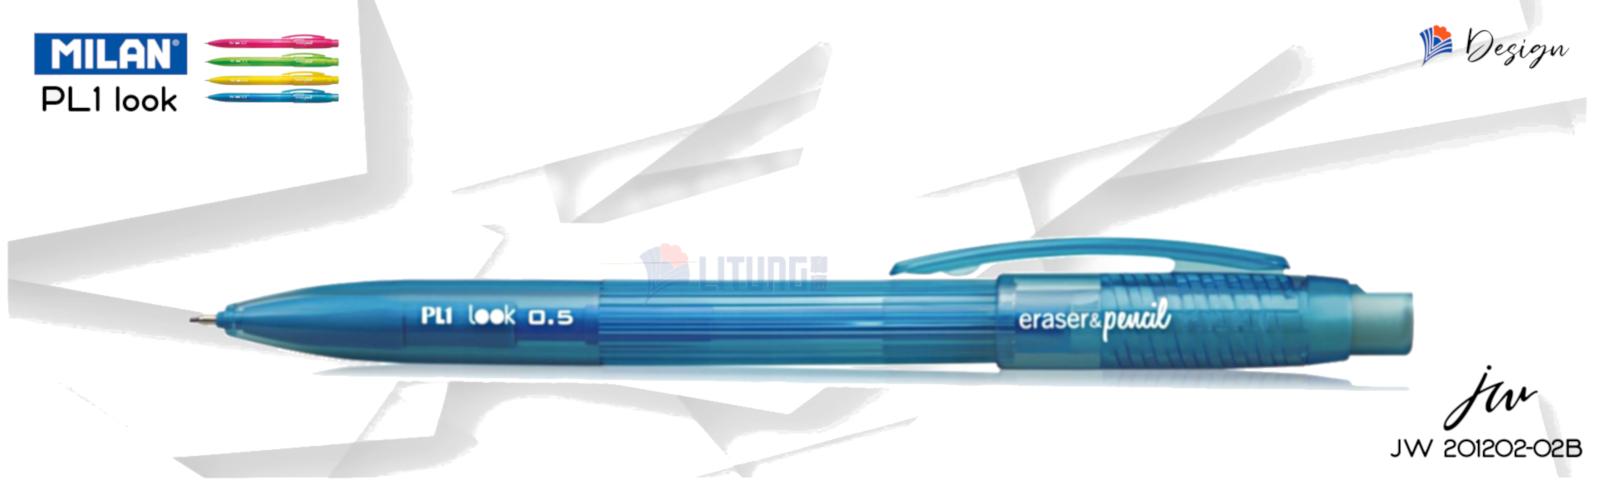 Banner Milan Mechanical Blue pencil w White Background 1600x500